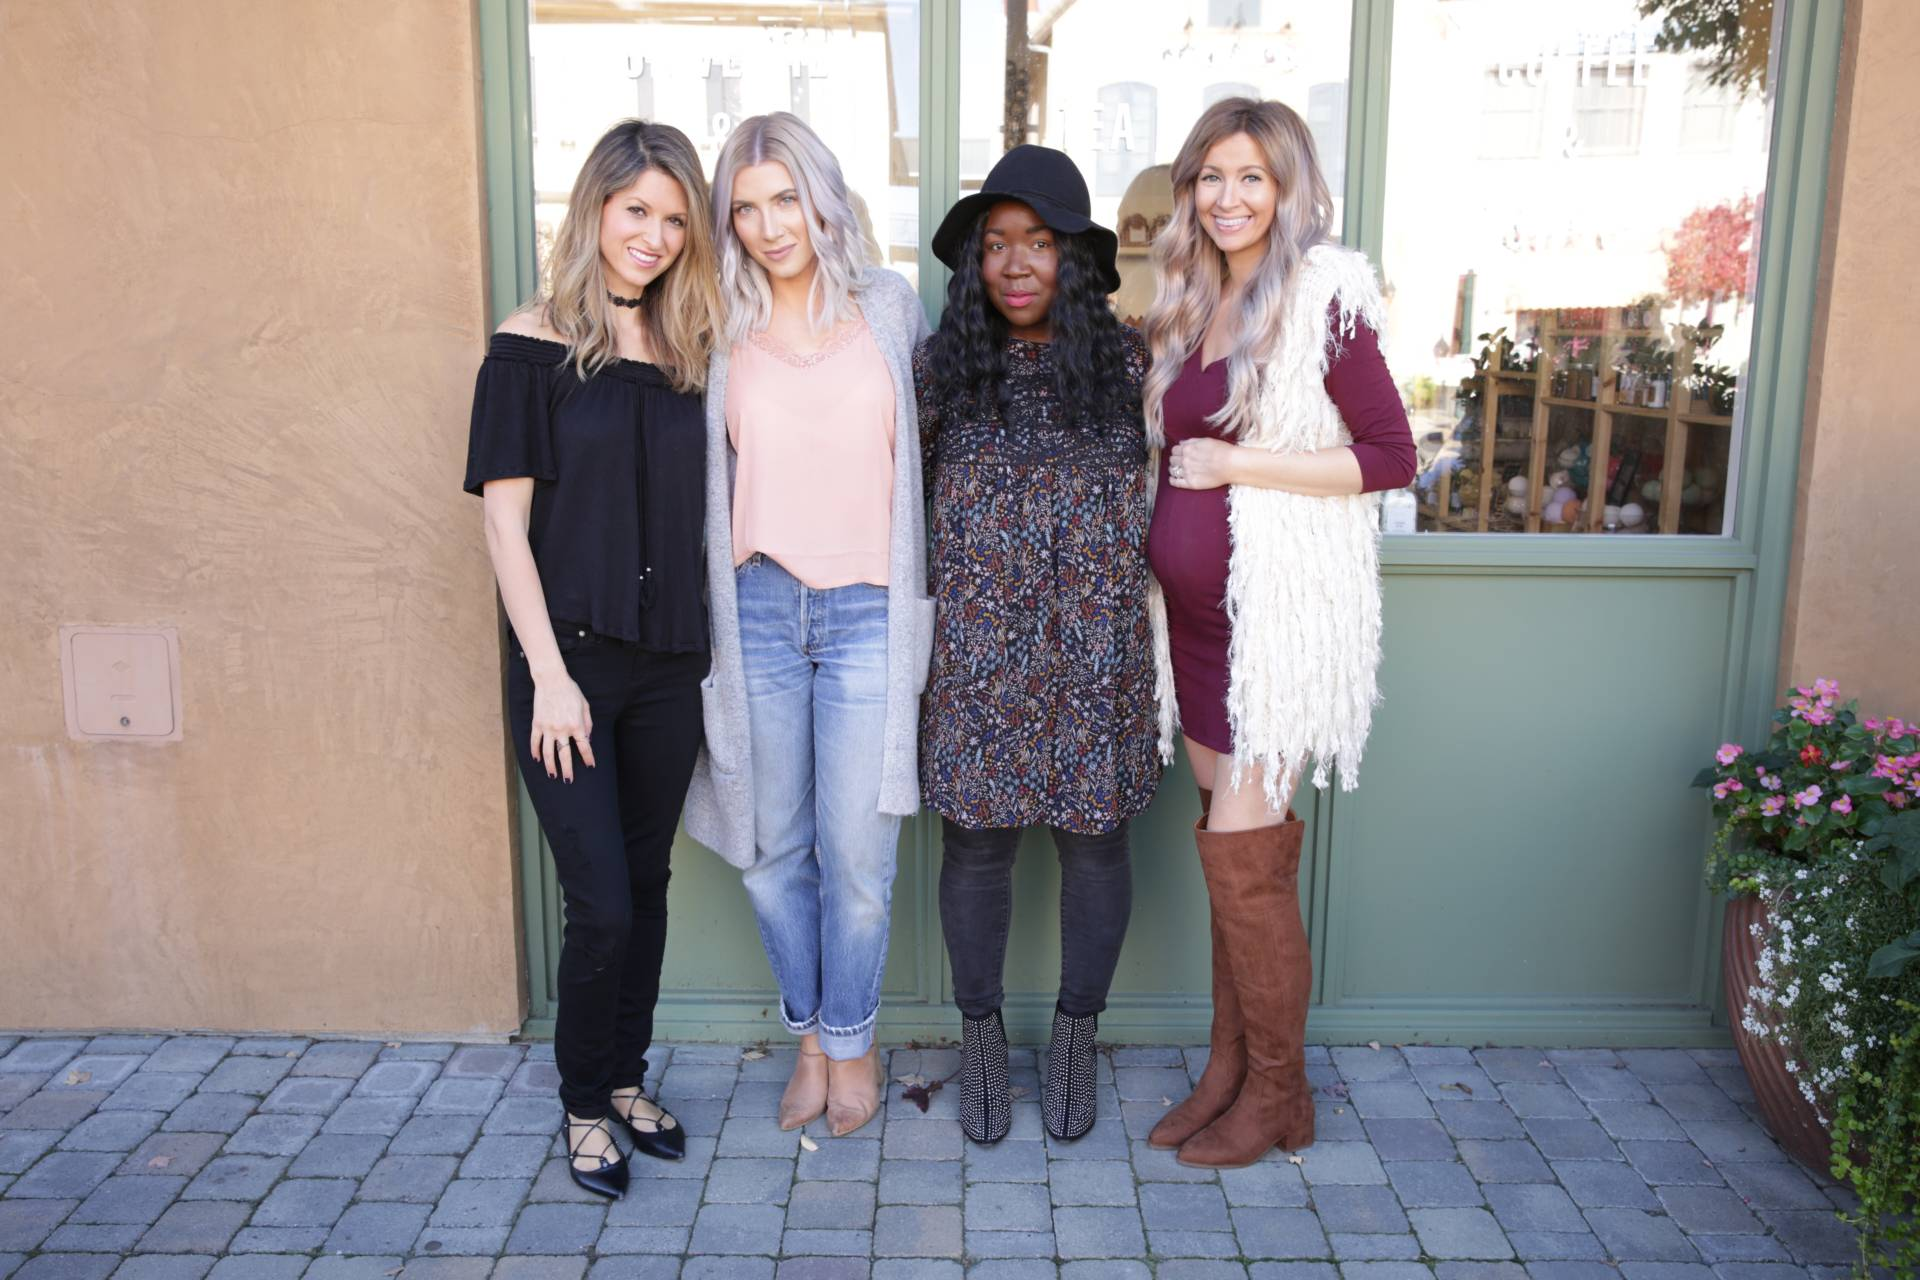 fashion-blogger-closet-sale-teaoxics-re-cap- bloggers